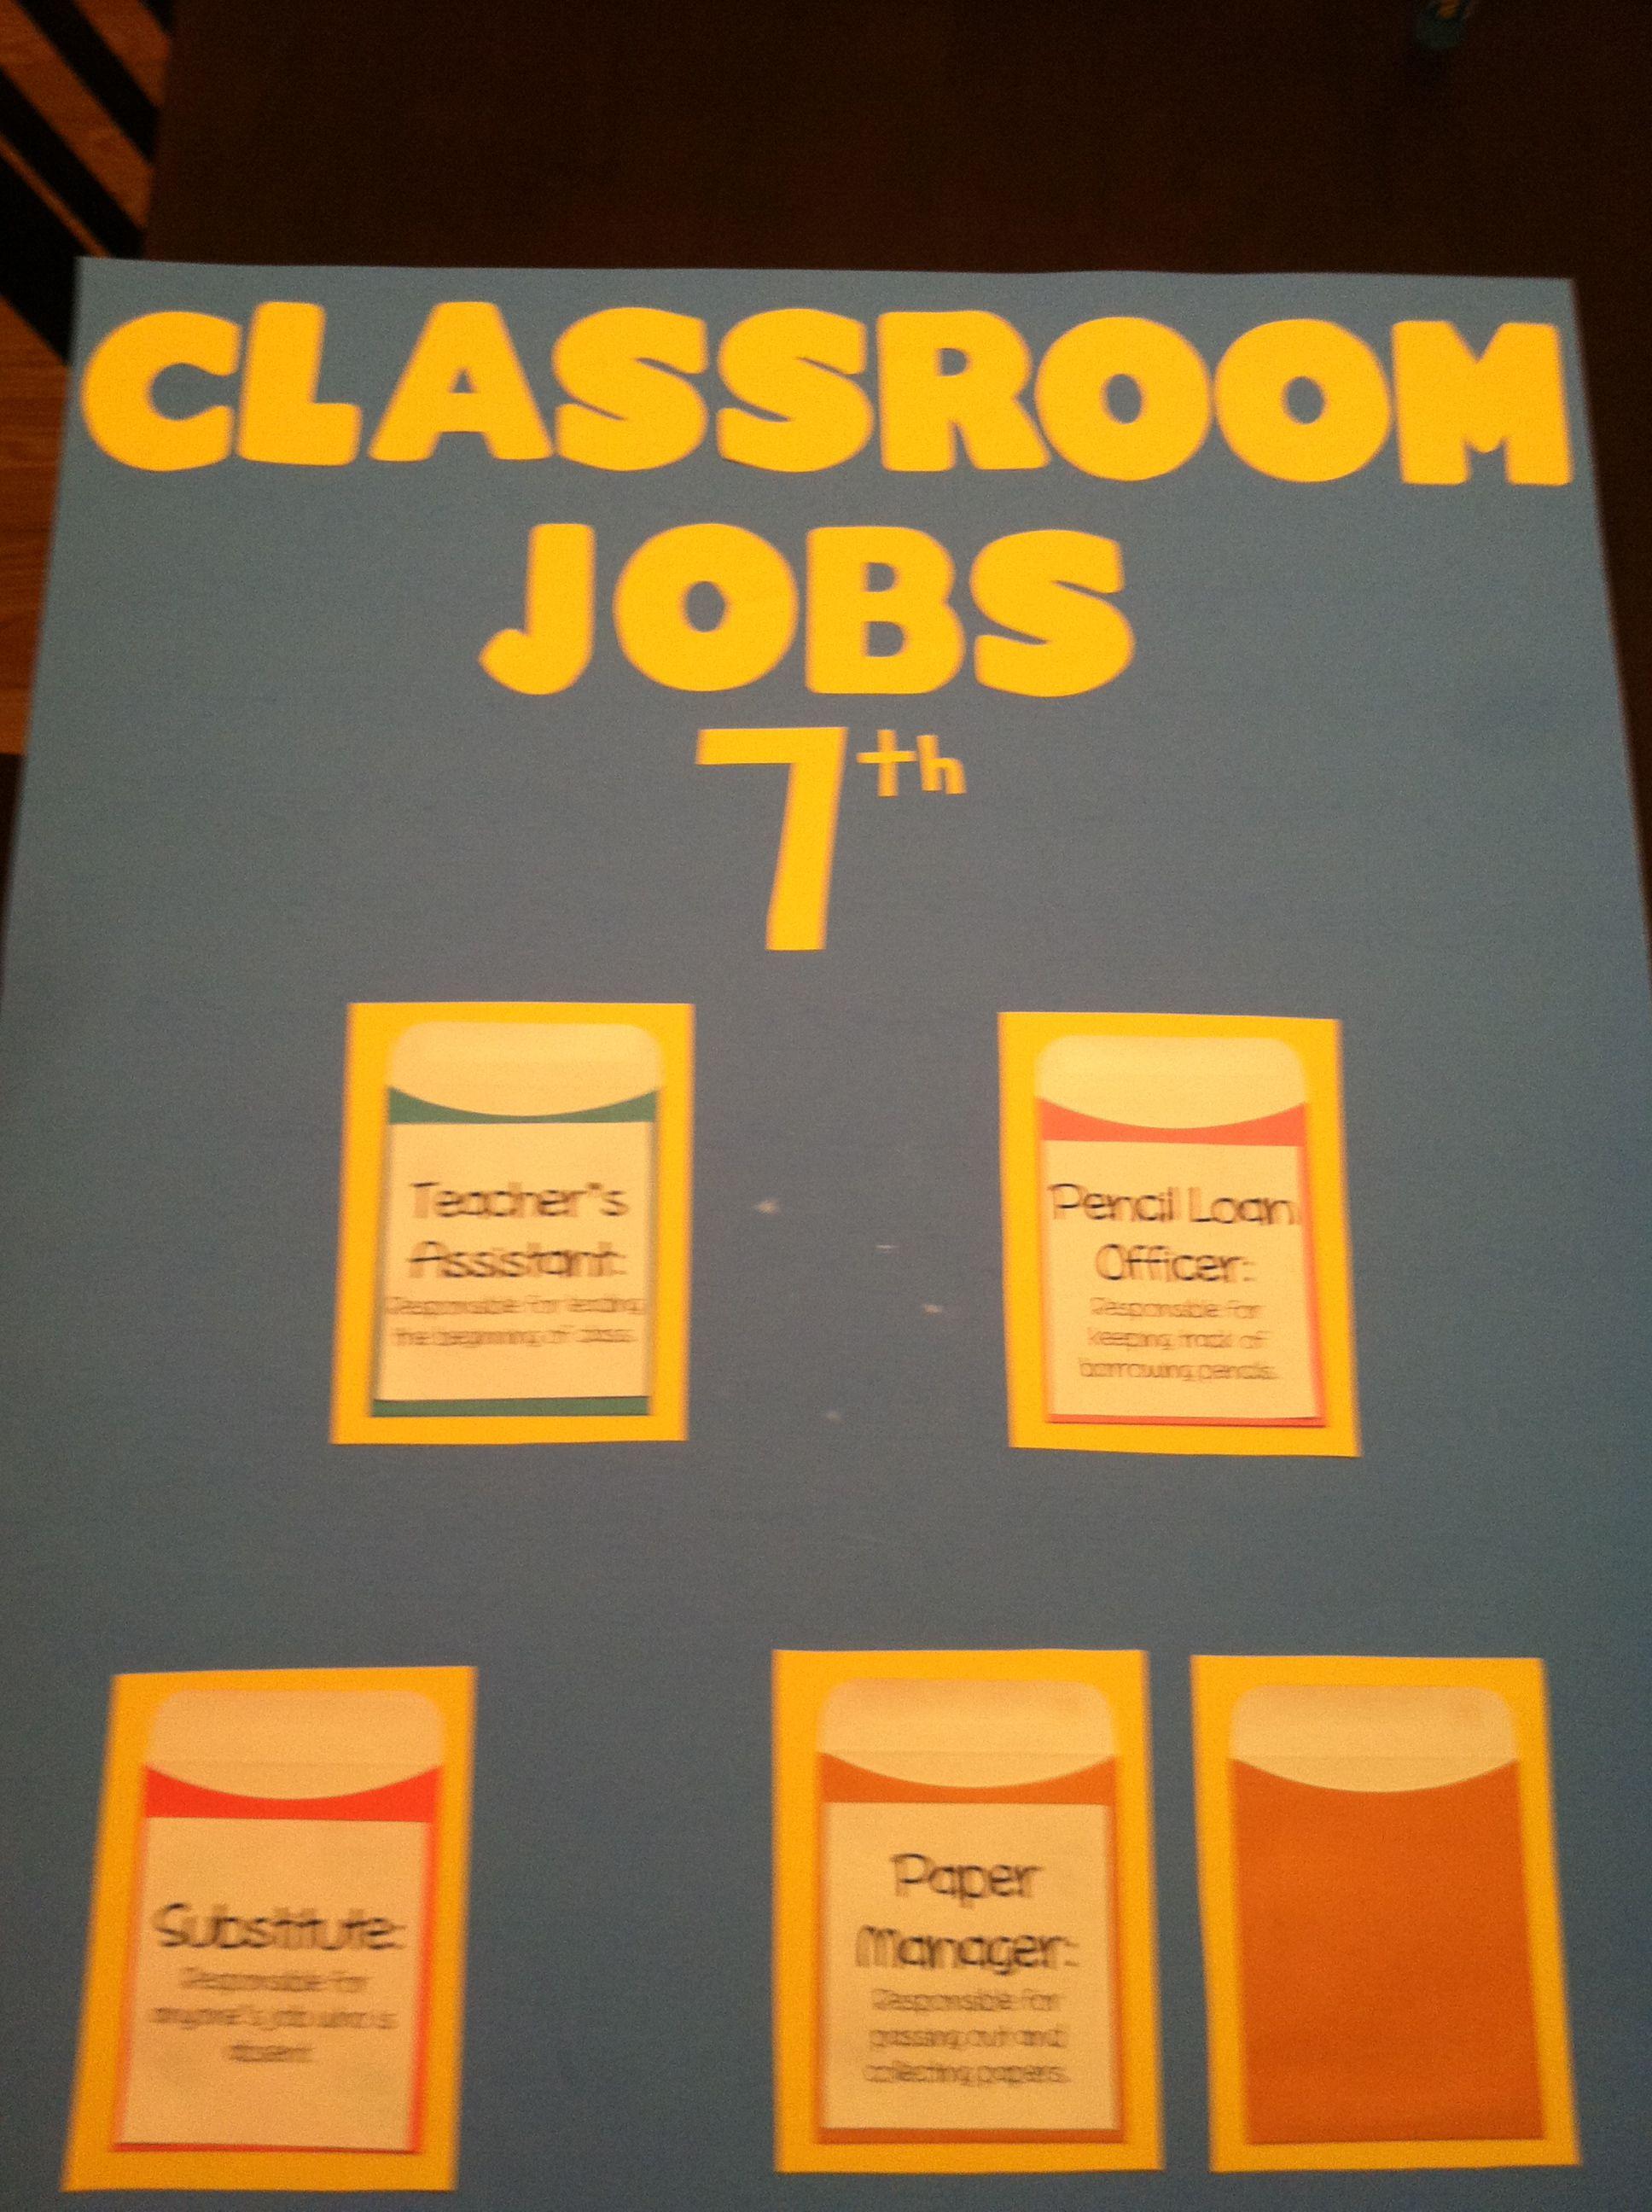 Classroom procedures classroom organization classroom management - Classroom Jobs For Middle School